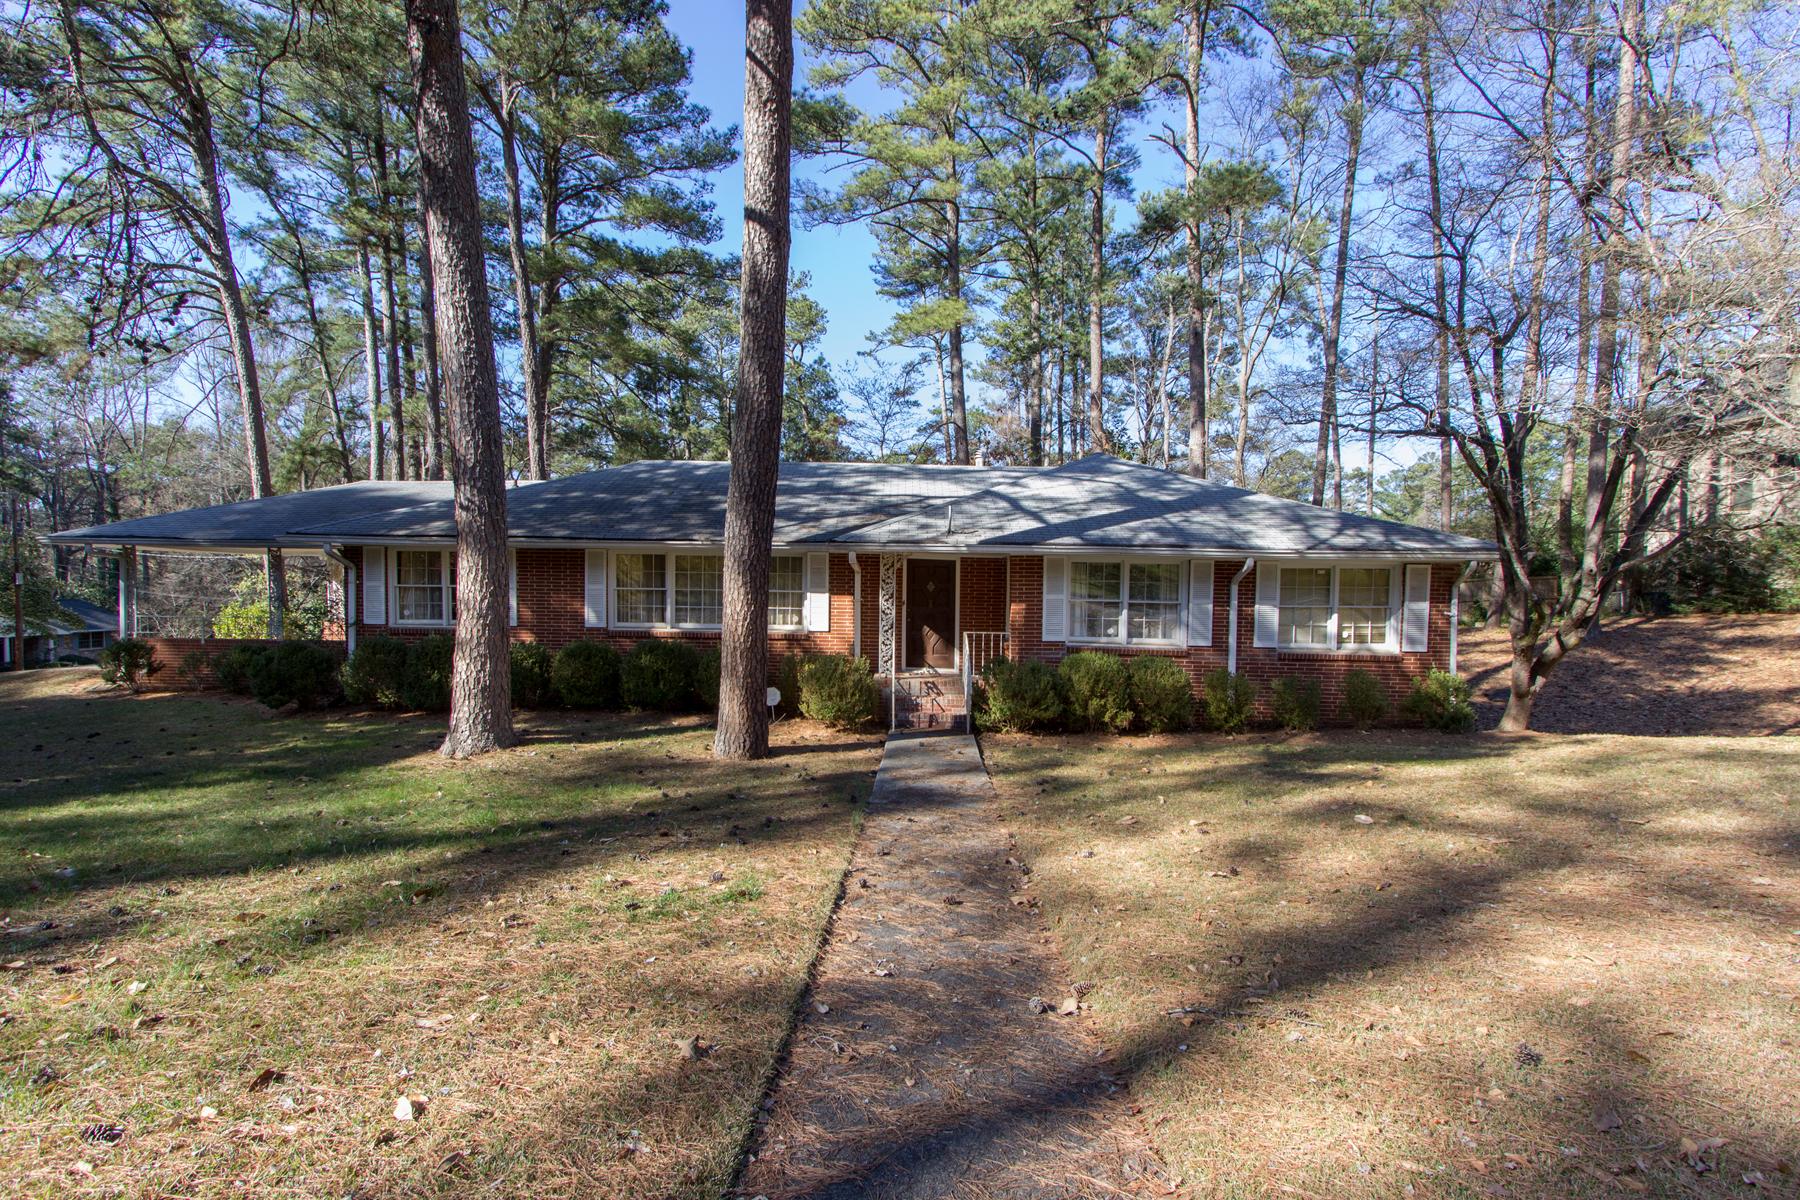 独户住宅 为 销售 在 All Brick Home In Amazing Location 1412 Dalewood Drive NE 亚特兰大, 乔治亚州, 30329 美国